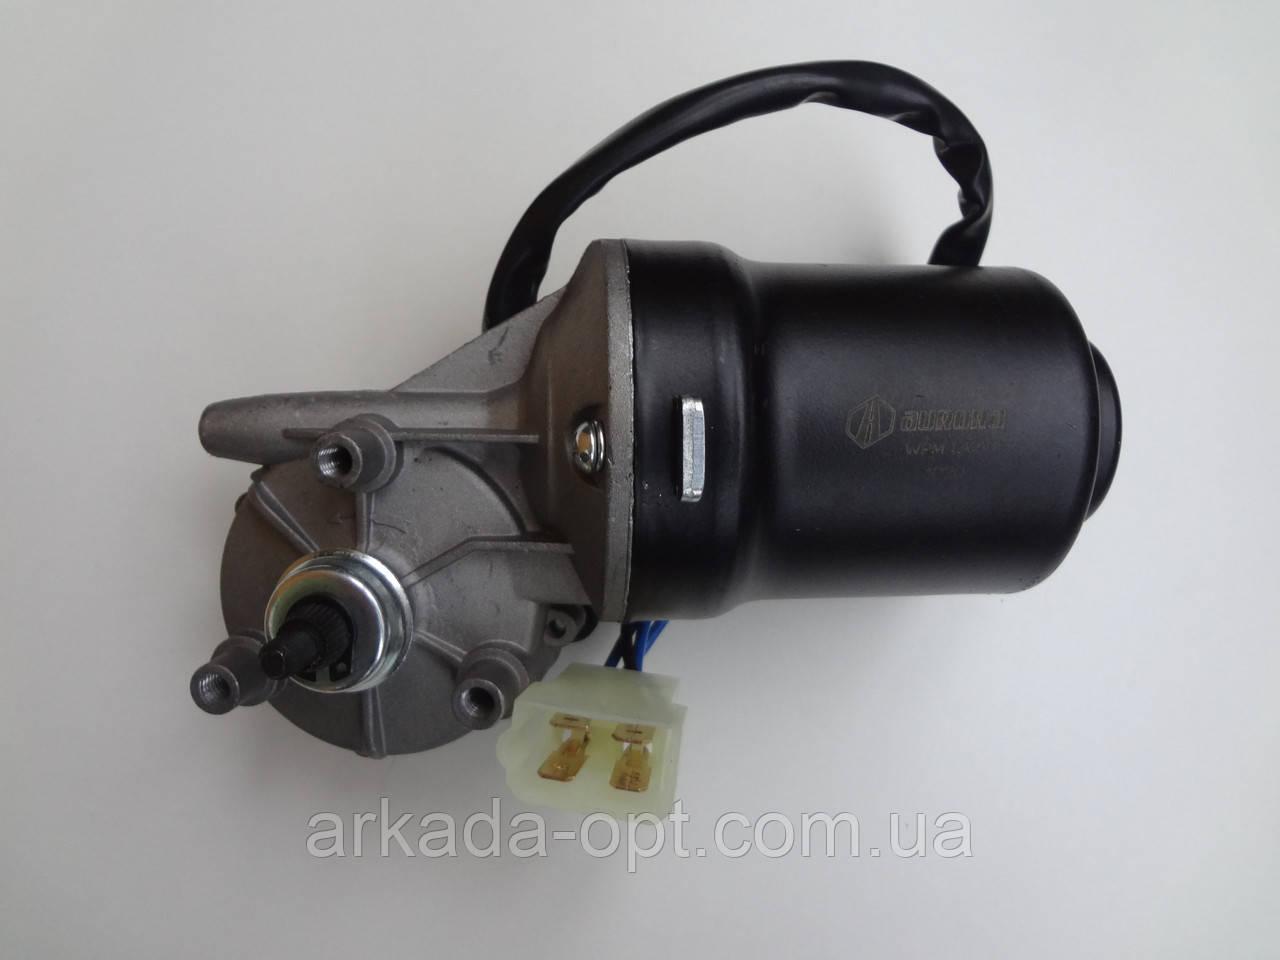 Мотор стеклоочистителя моторедуктор ВАЗ 2101 2107 2121 Aurora